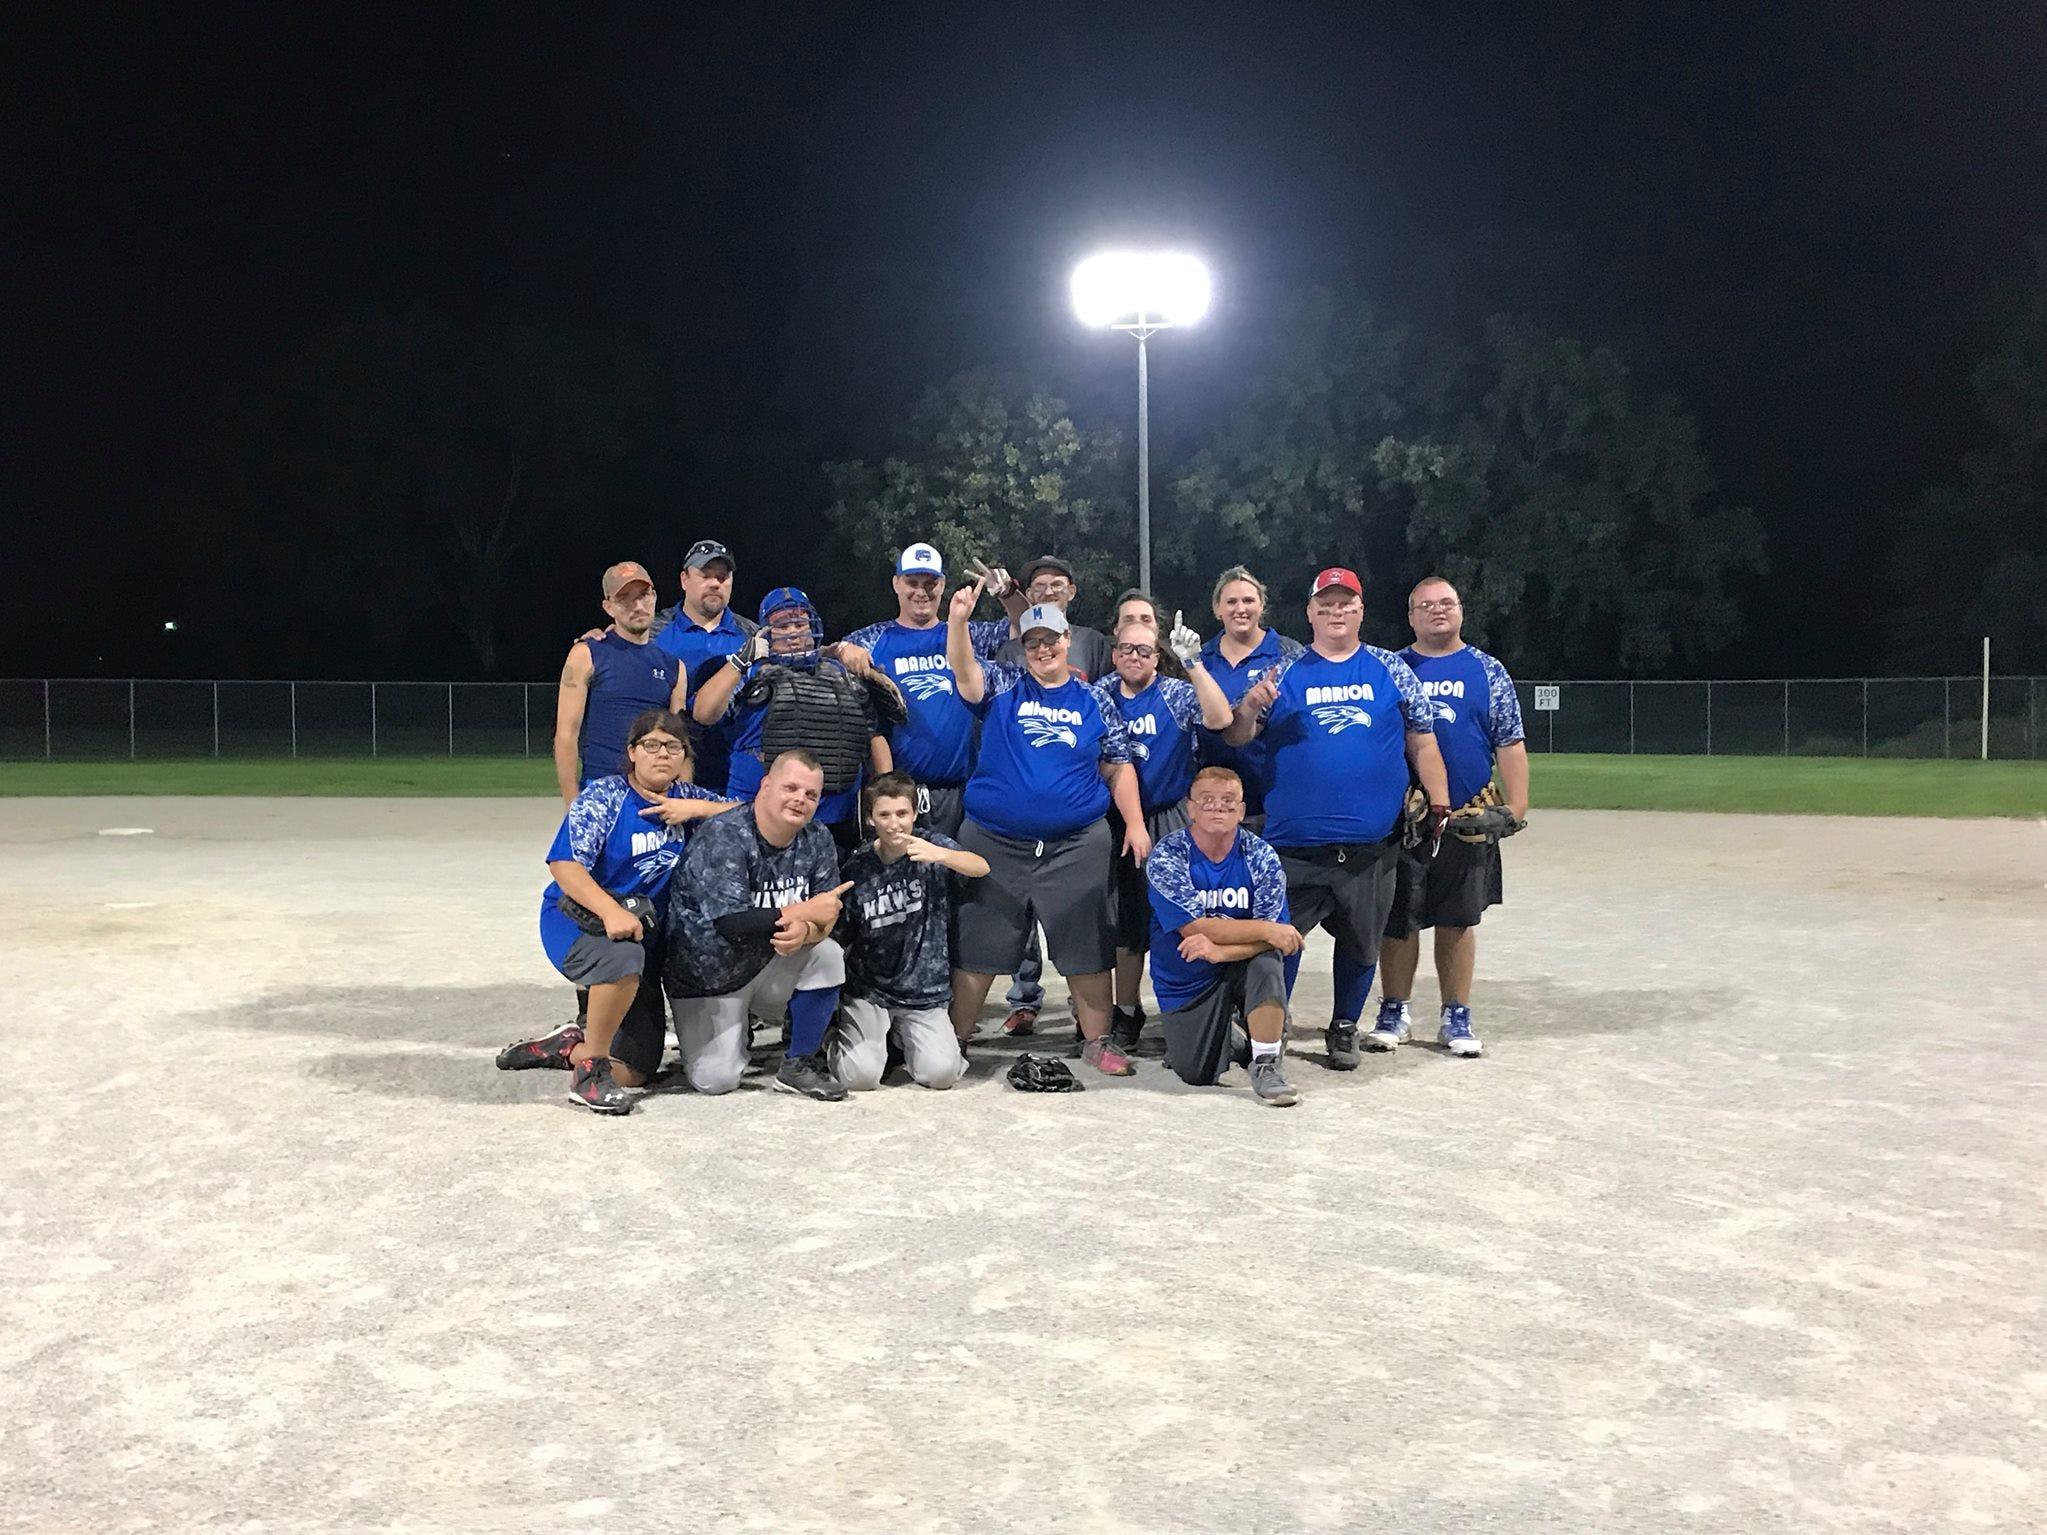 The Marion County Hawks softball team.